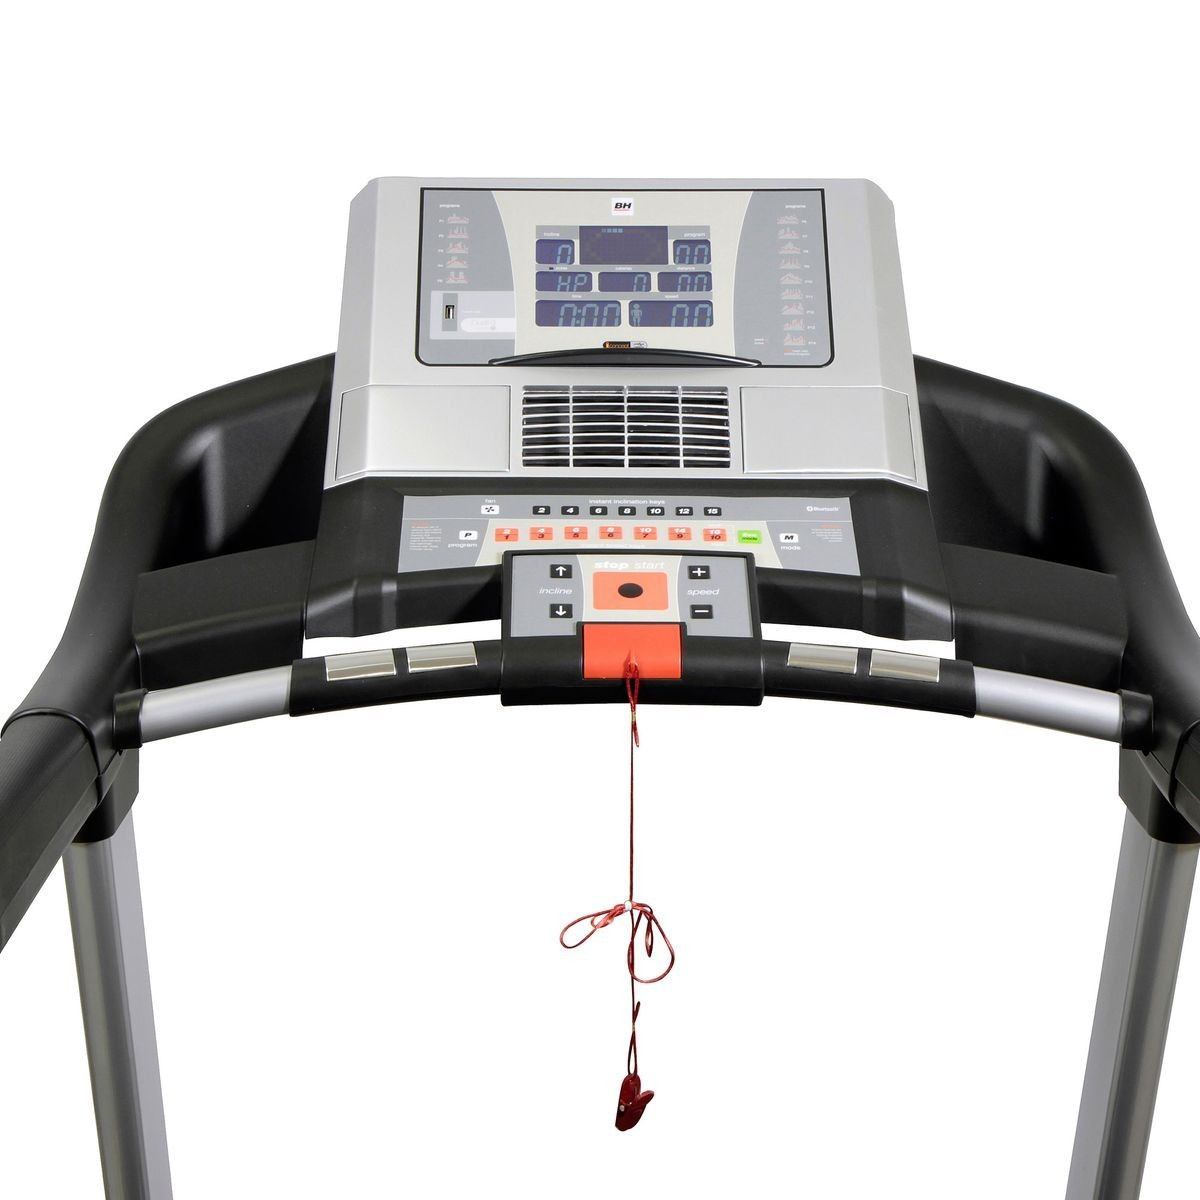 Bh Fitness F4 Dual G6426n Tapis De Course Pliable 20 Km H